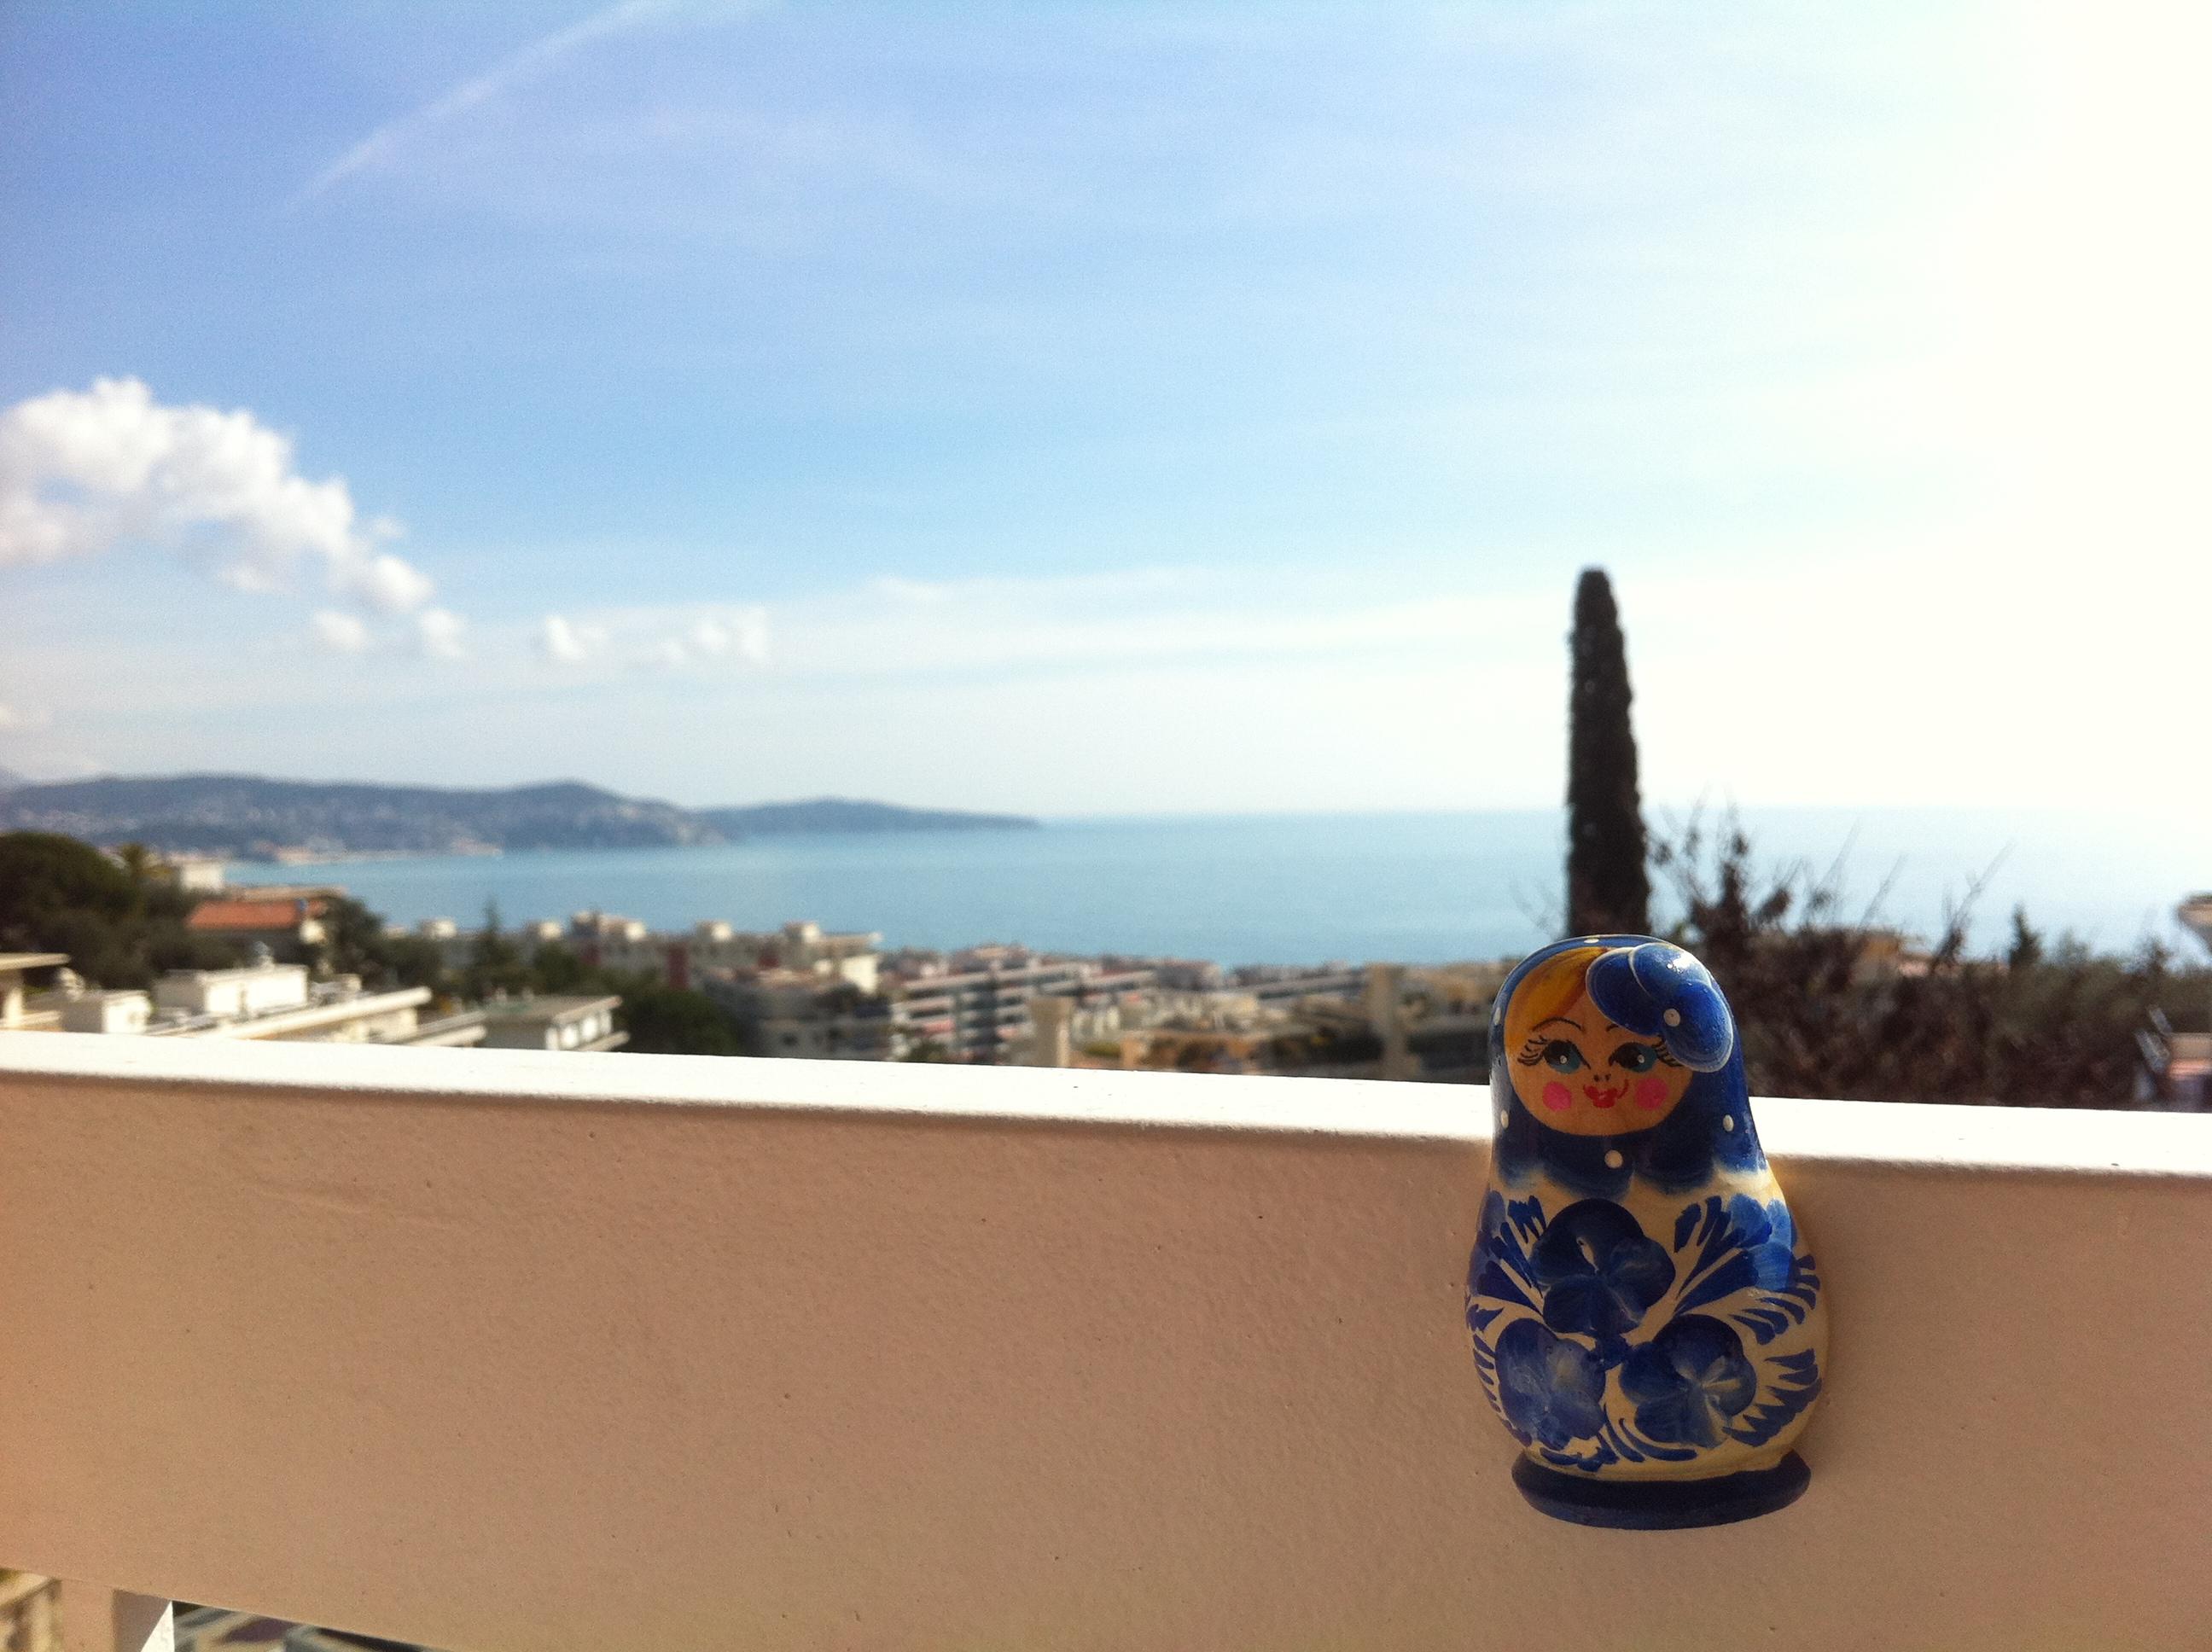 La diaspora russe aime la ville de Nice